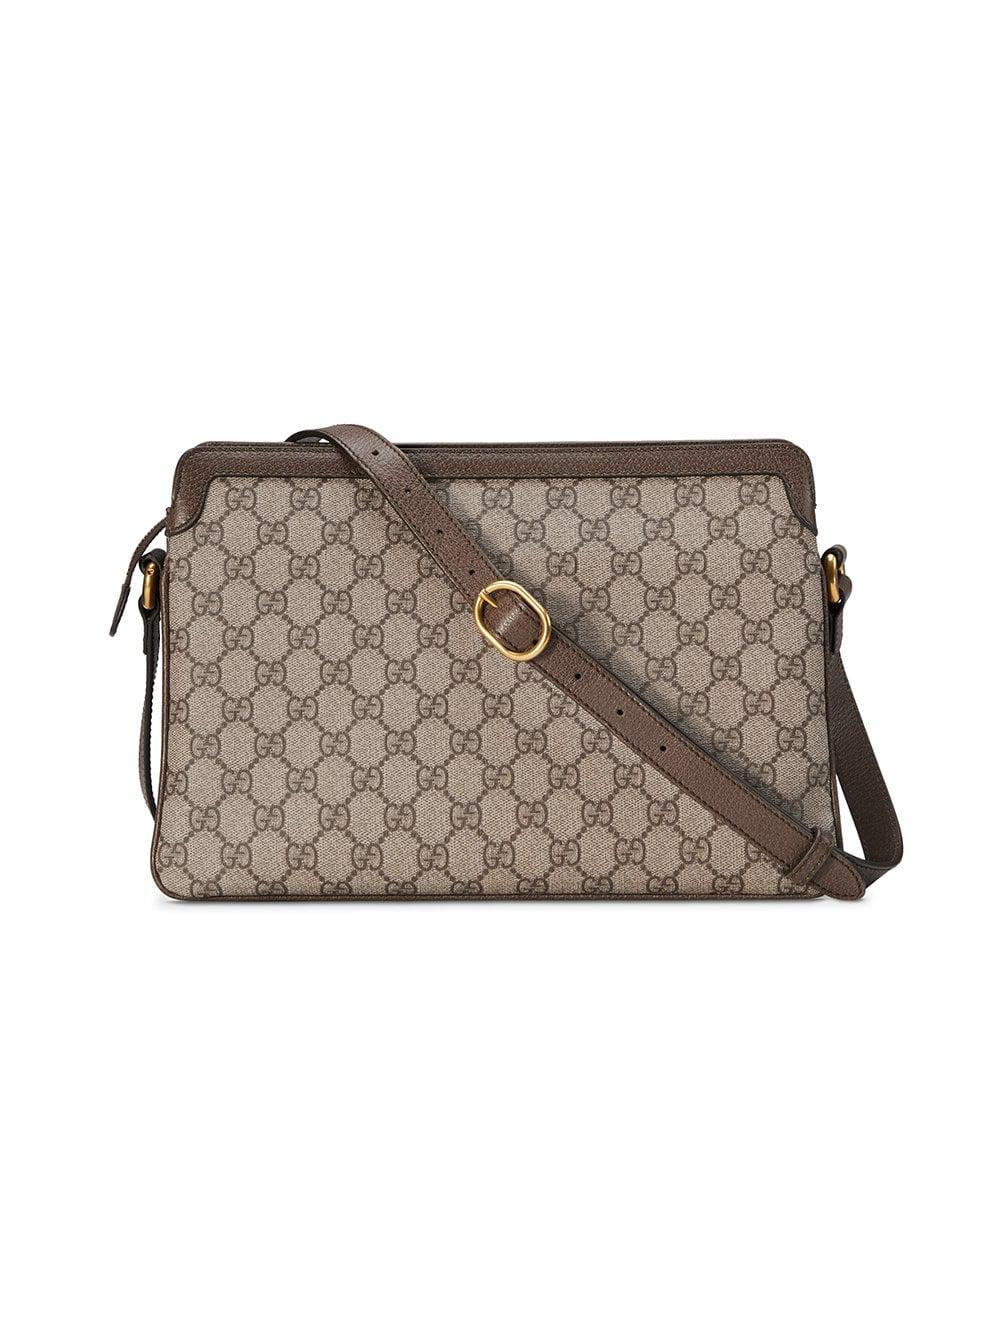 795c95152ab Lyst - Gucci GG Supreme Medium Shoulder Bag